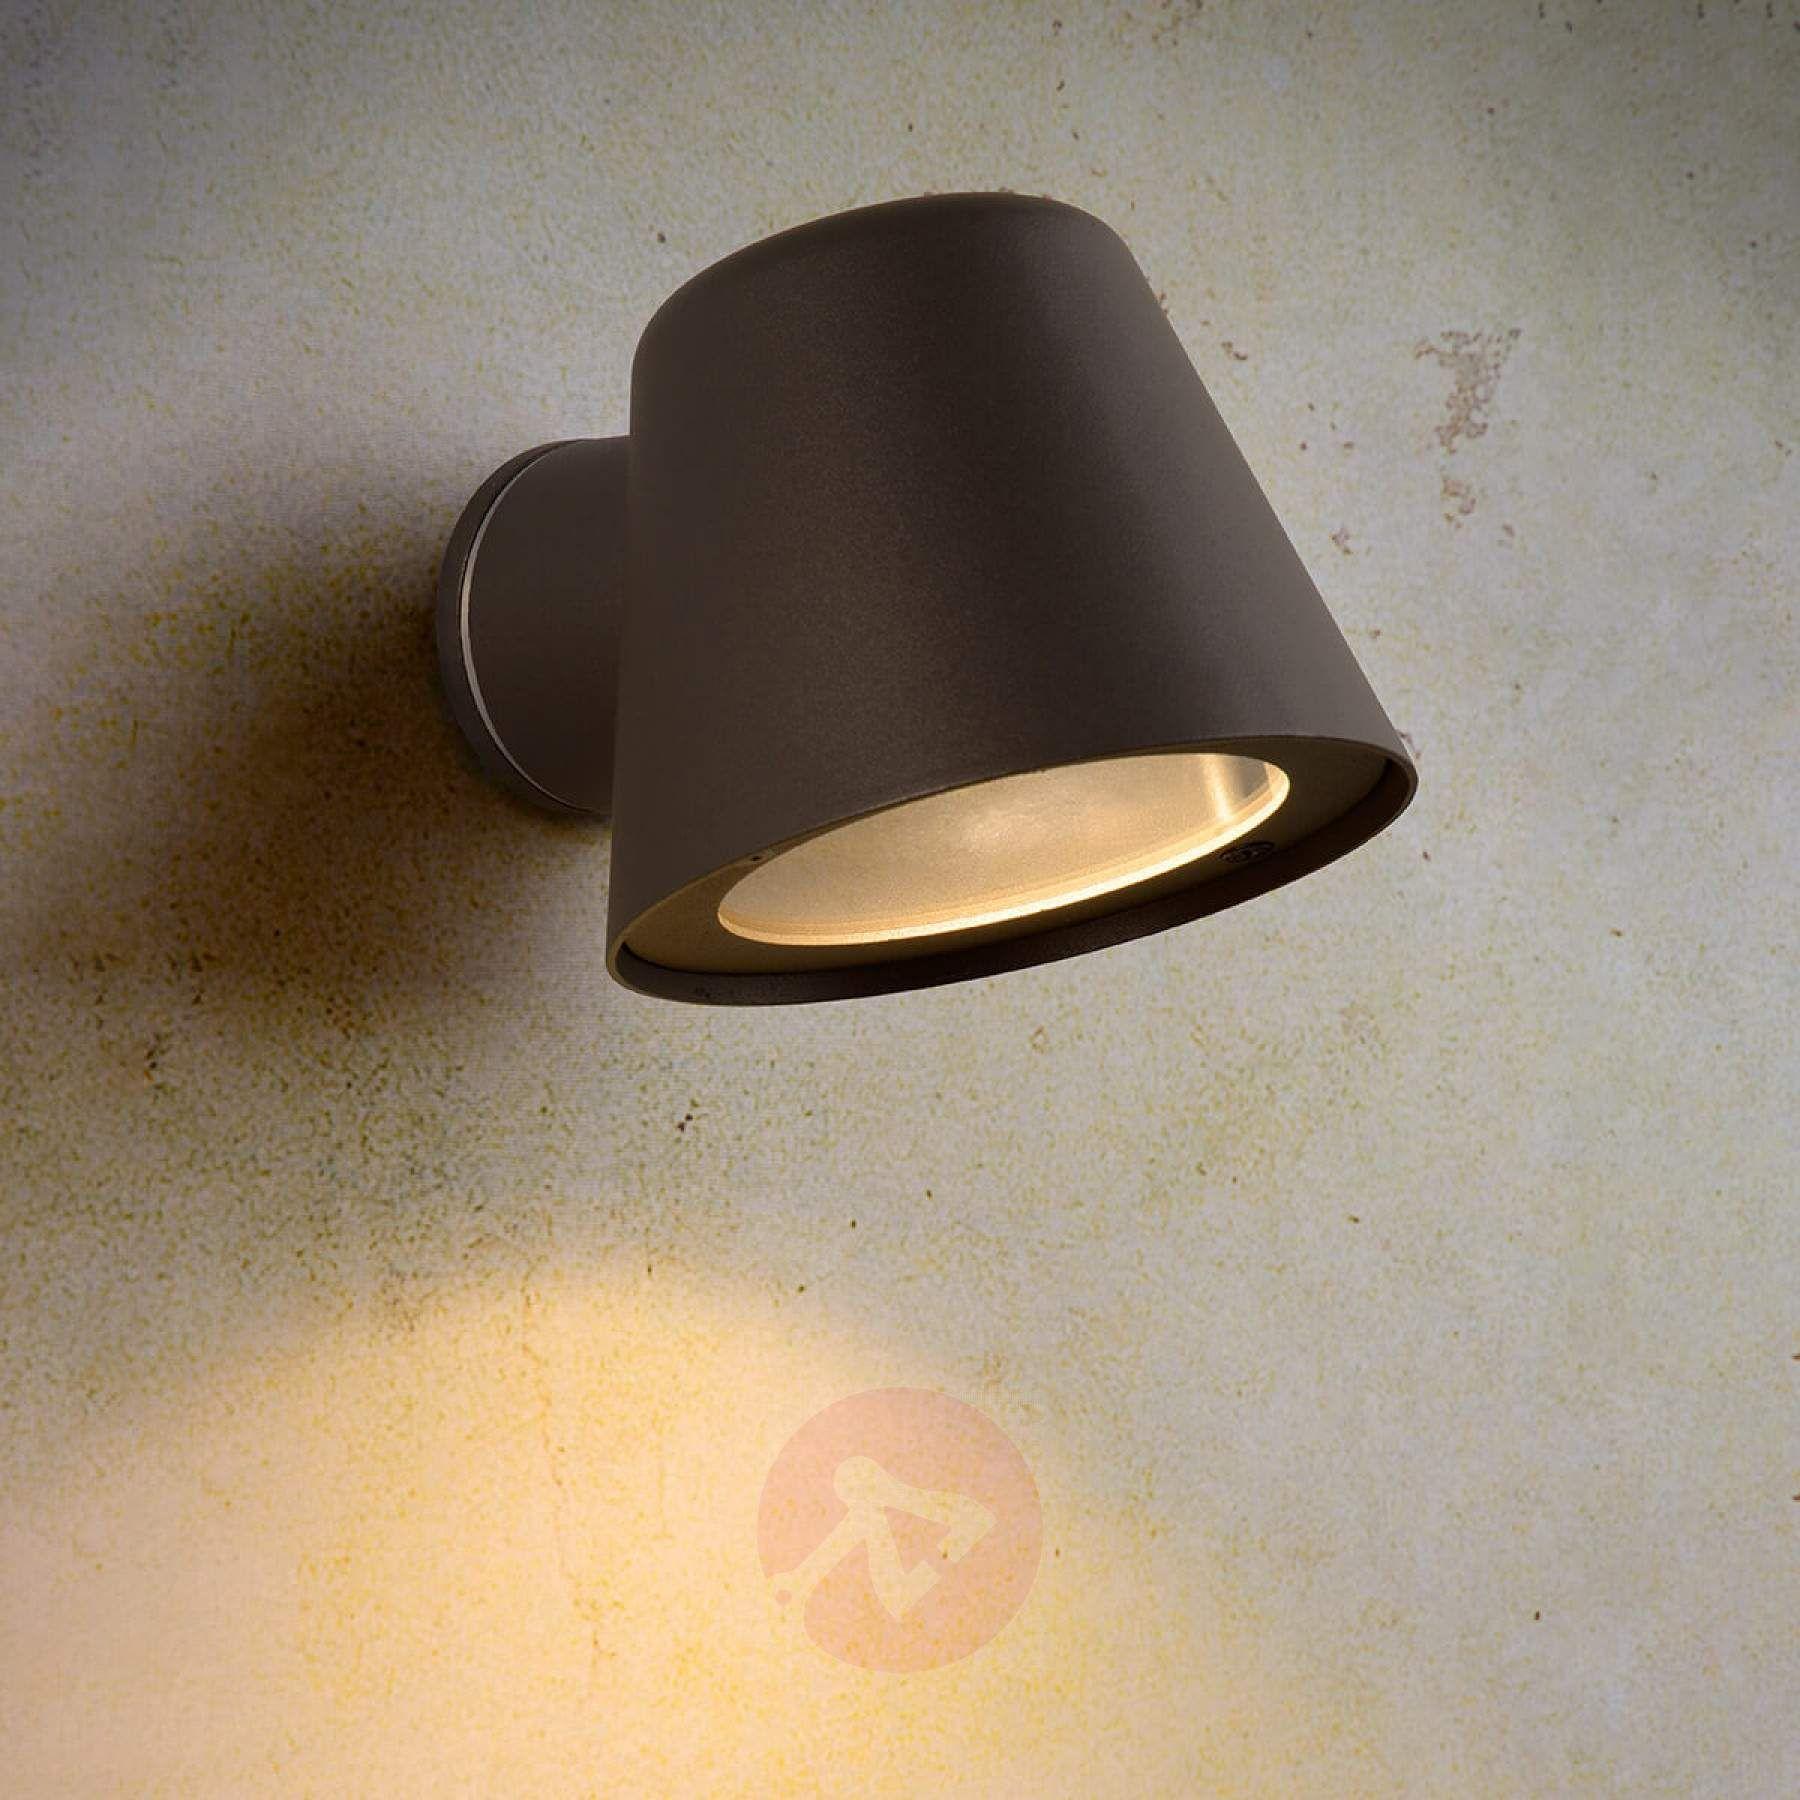 Czarny Kinkiet Zewnetrzny Led Dingo Gu10 Lampy Pl Led Outdoor Wall Lights Wall Lights Outdoor Ceiling Lights